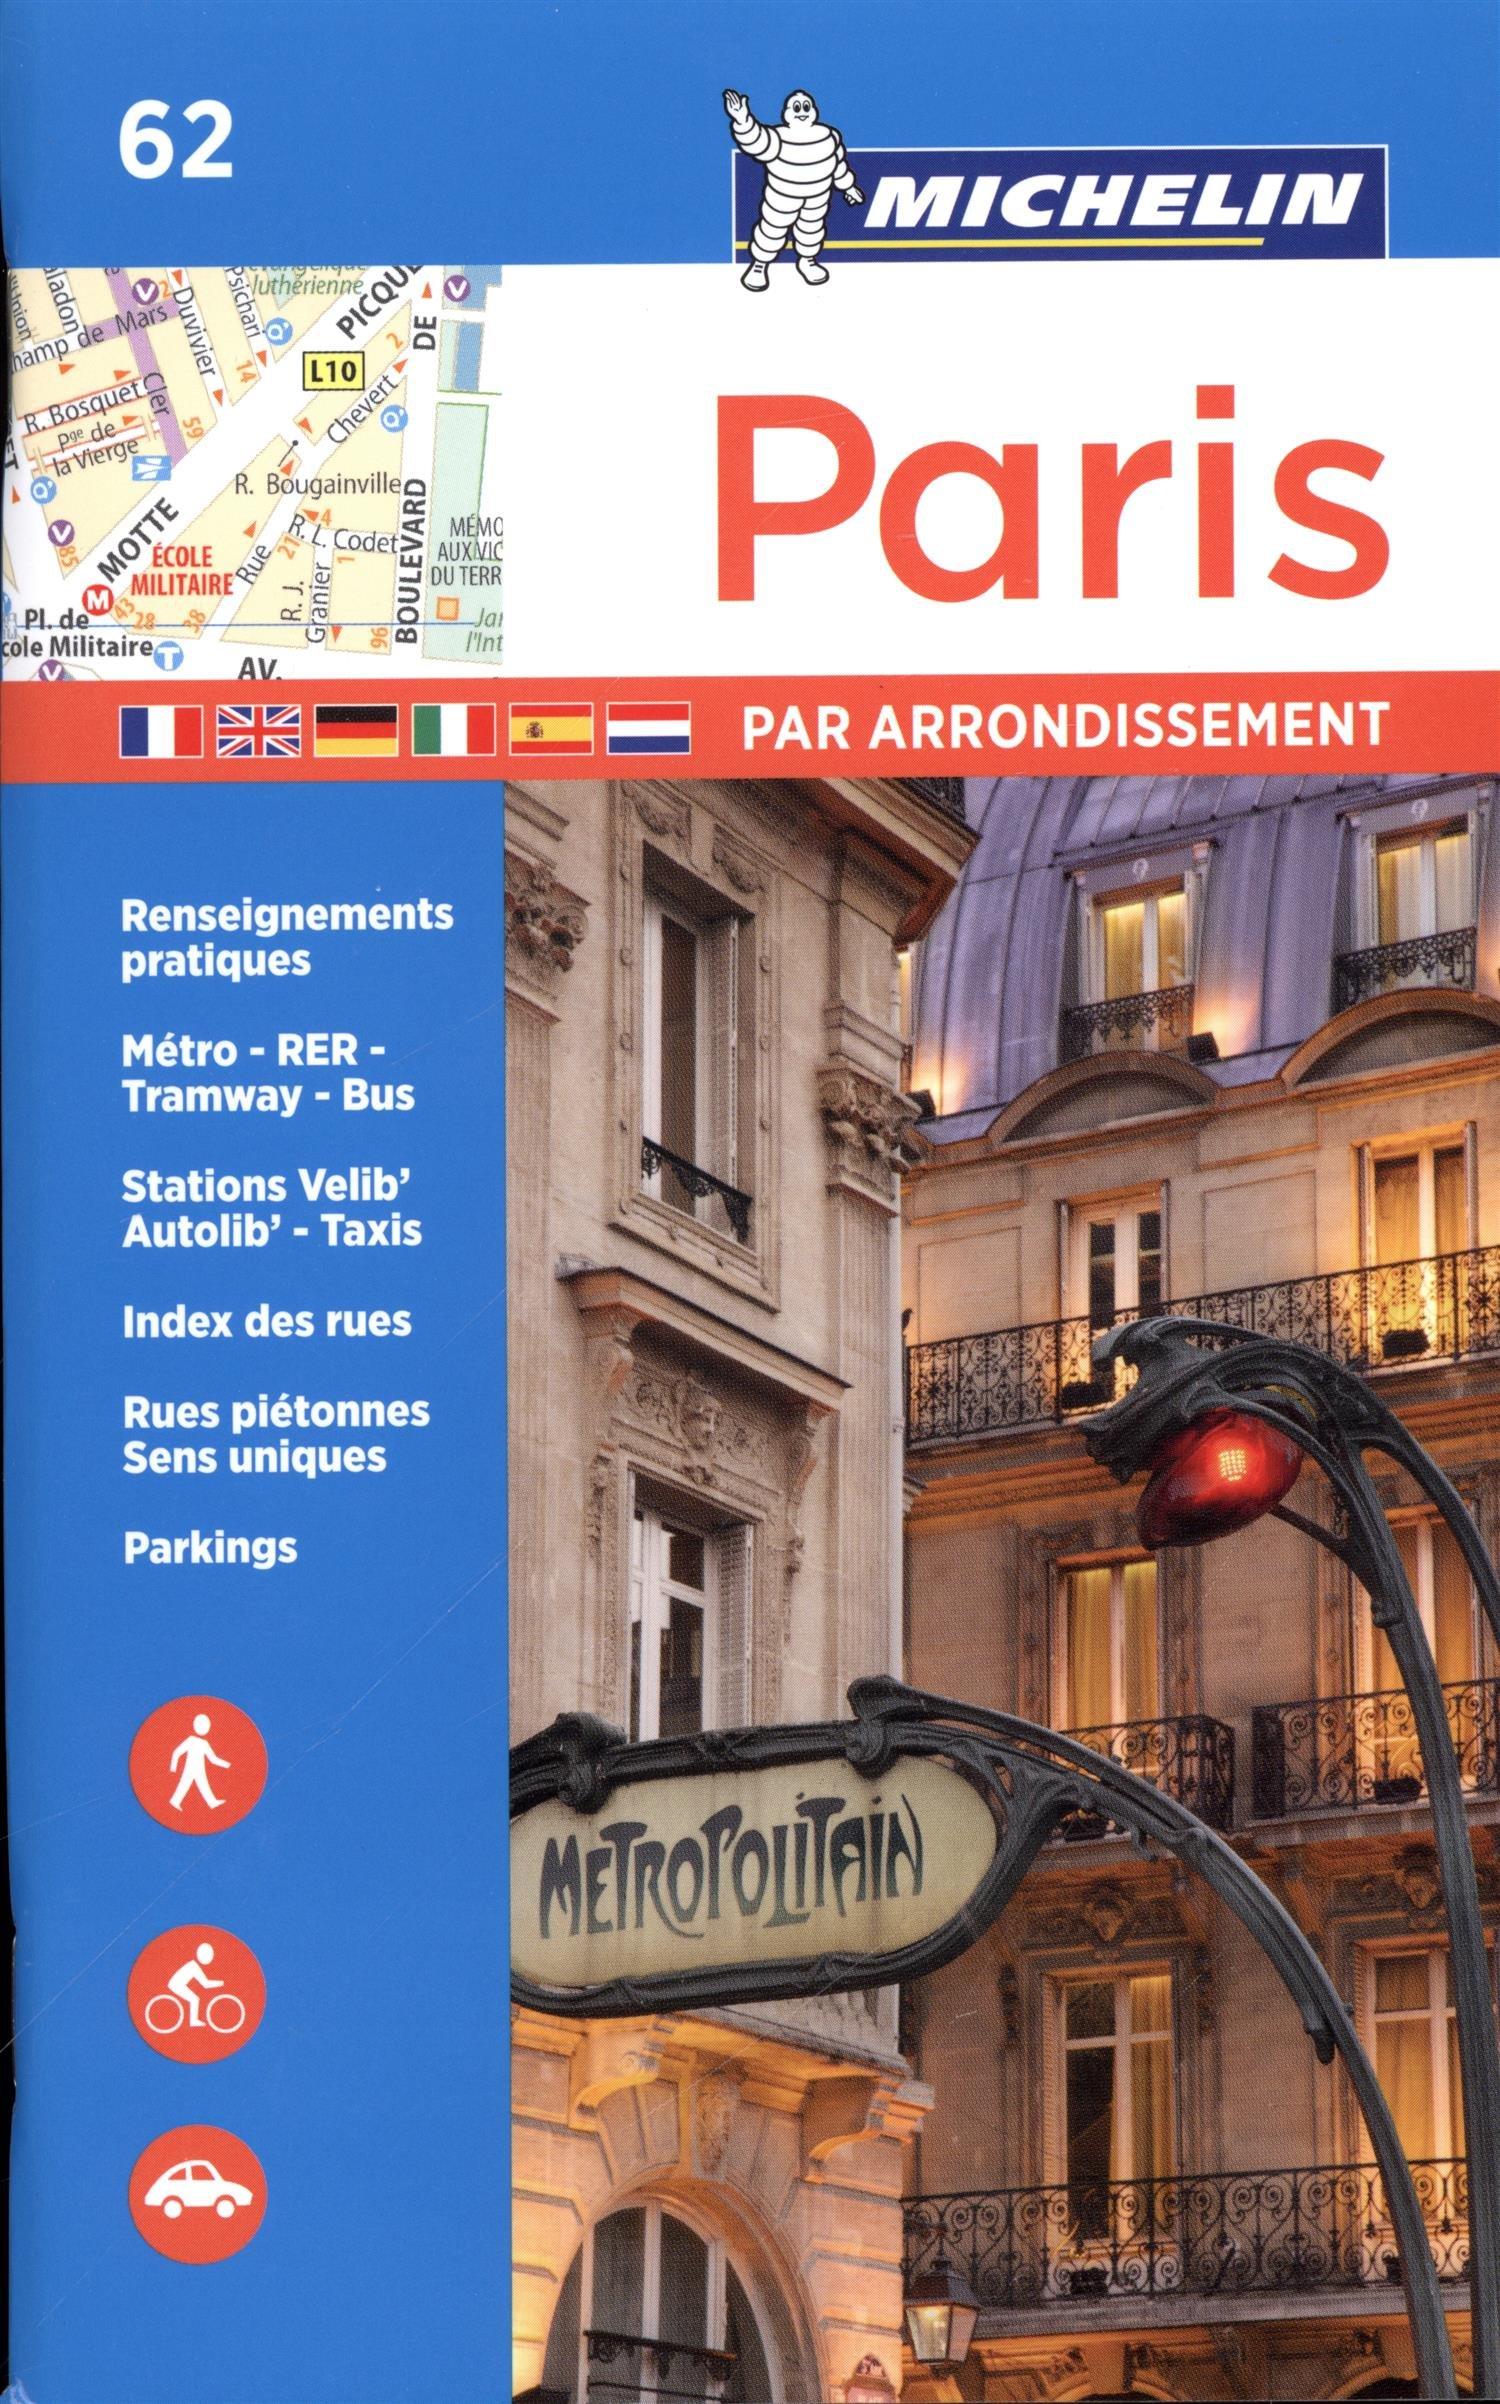 Michelin Paris by Arrondissements Pocket Atlas #62 (Michelin Map & Guide Series)